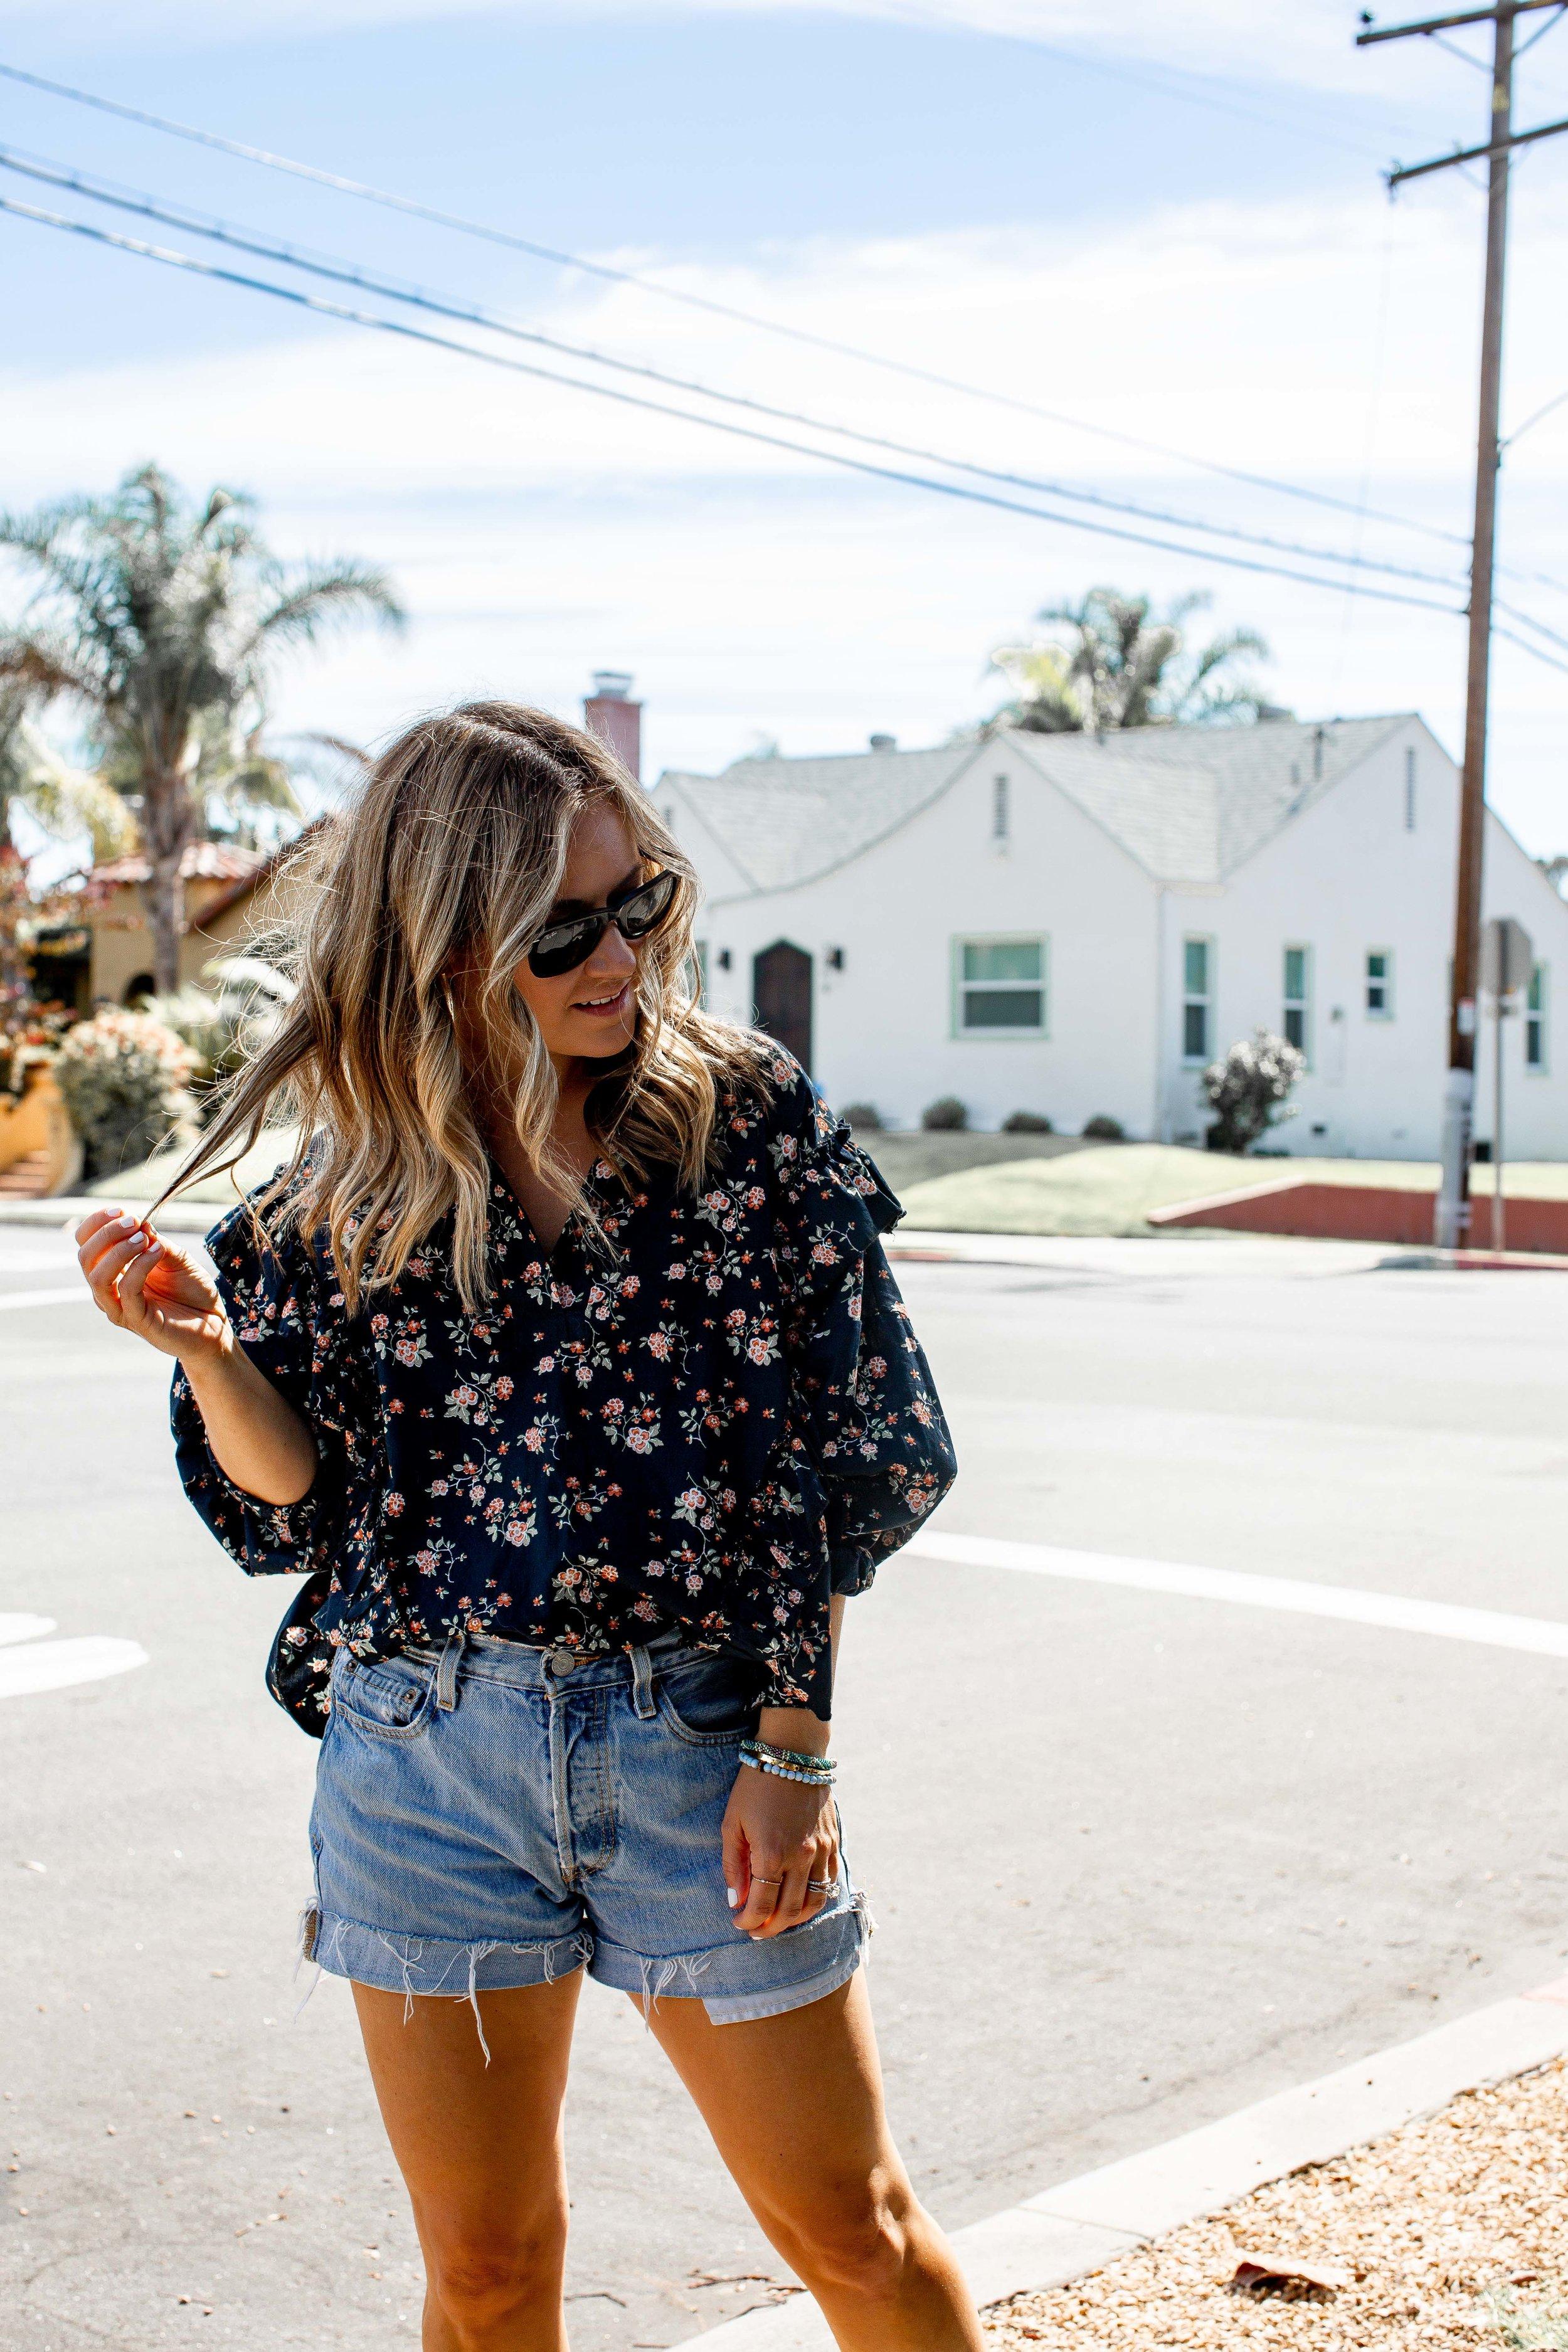 magill-navy-floral-blouse-7.jpg